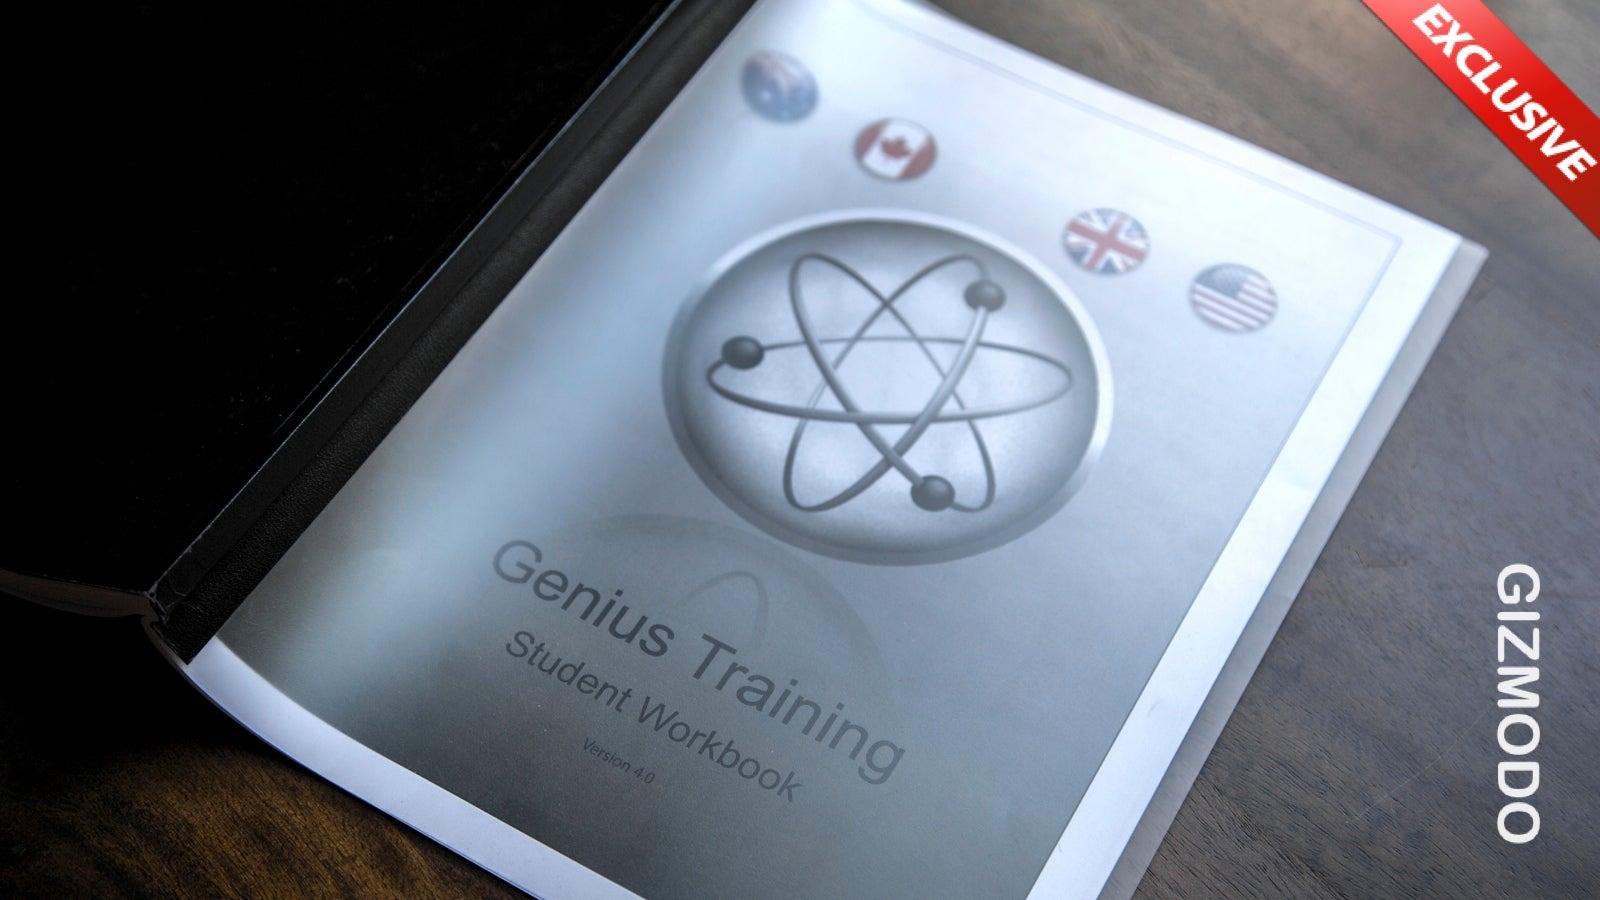 how to be a genius this is apple s secret employee training manual rh gizmodo com manual de macbook manual de macbook air en español